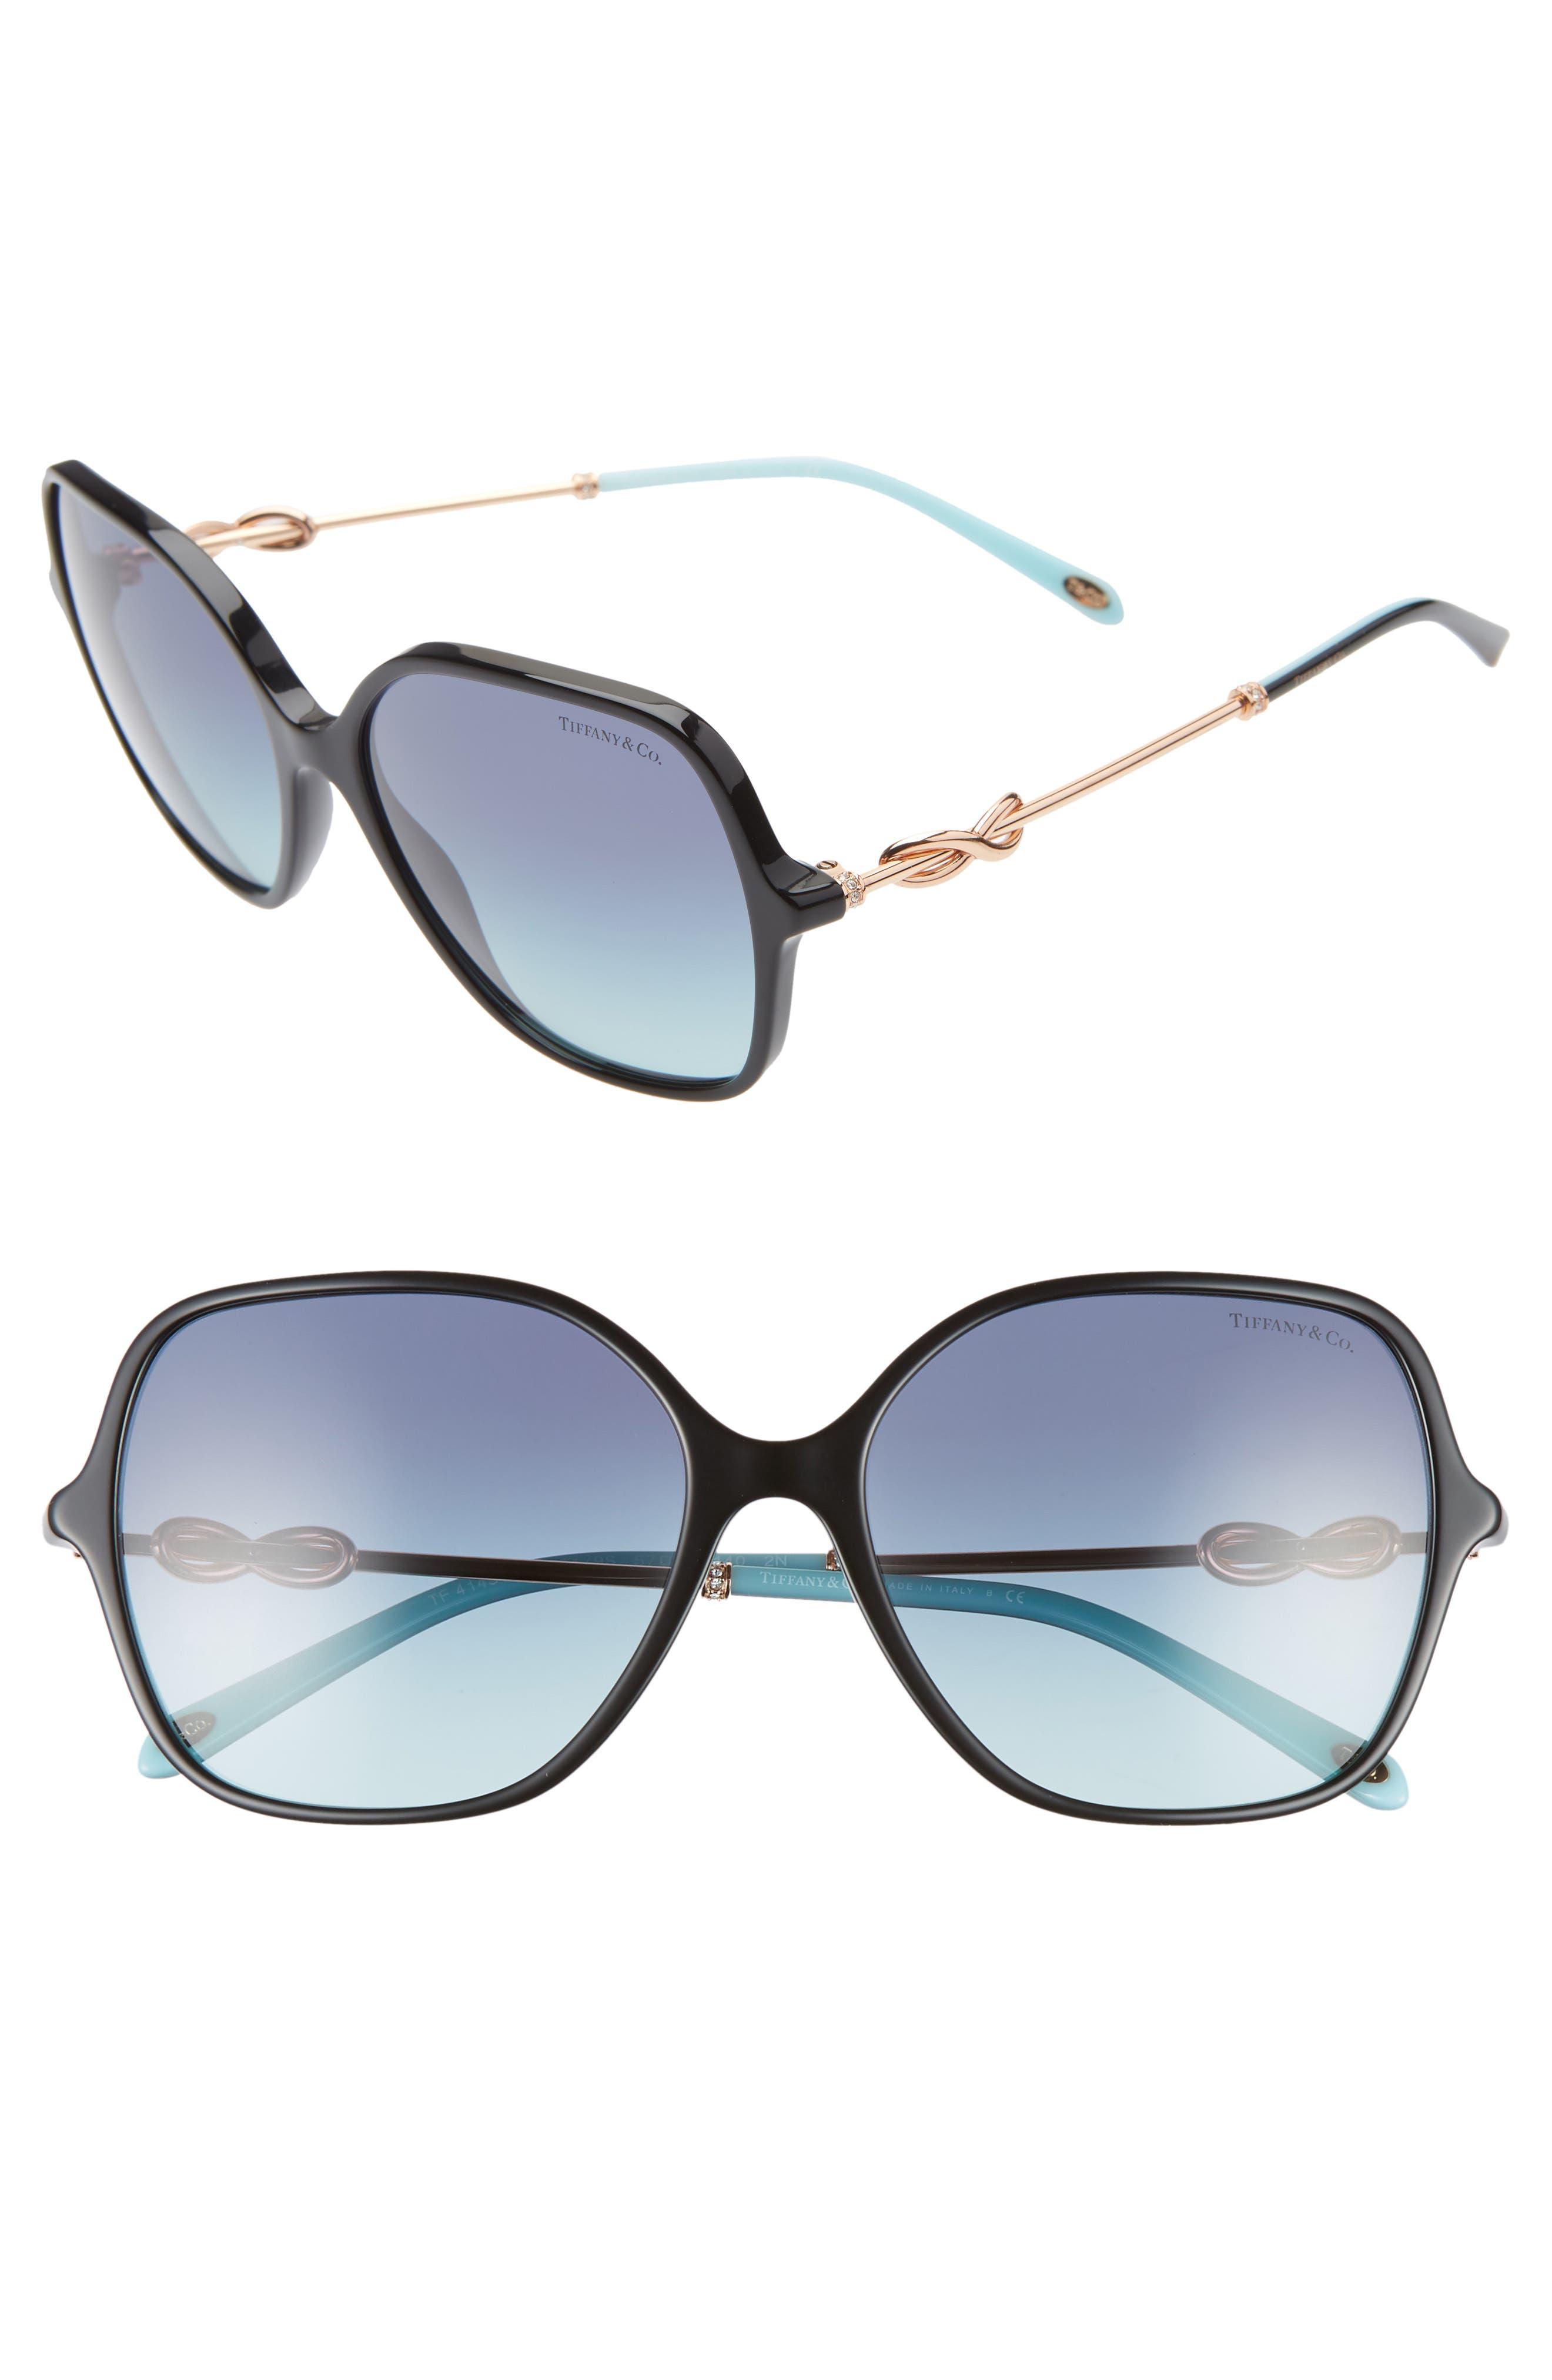 TIFFANY & CO. Tiffany 57mm Sunglasses, Main, color, BLACK/ AZURE GRADIENT